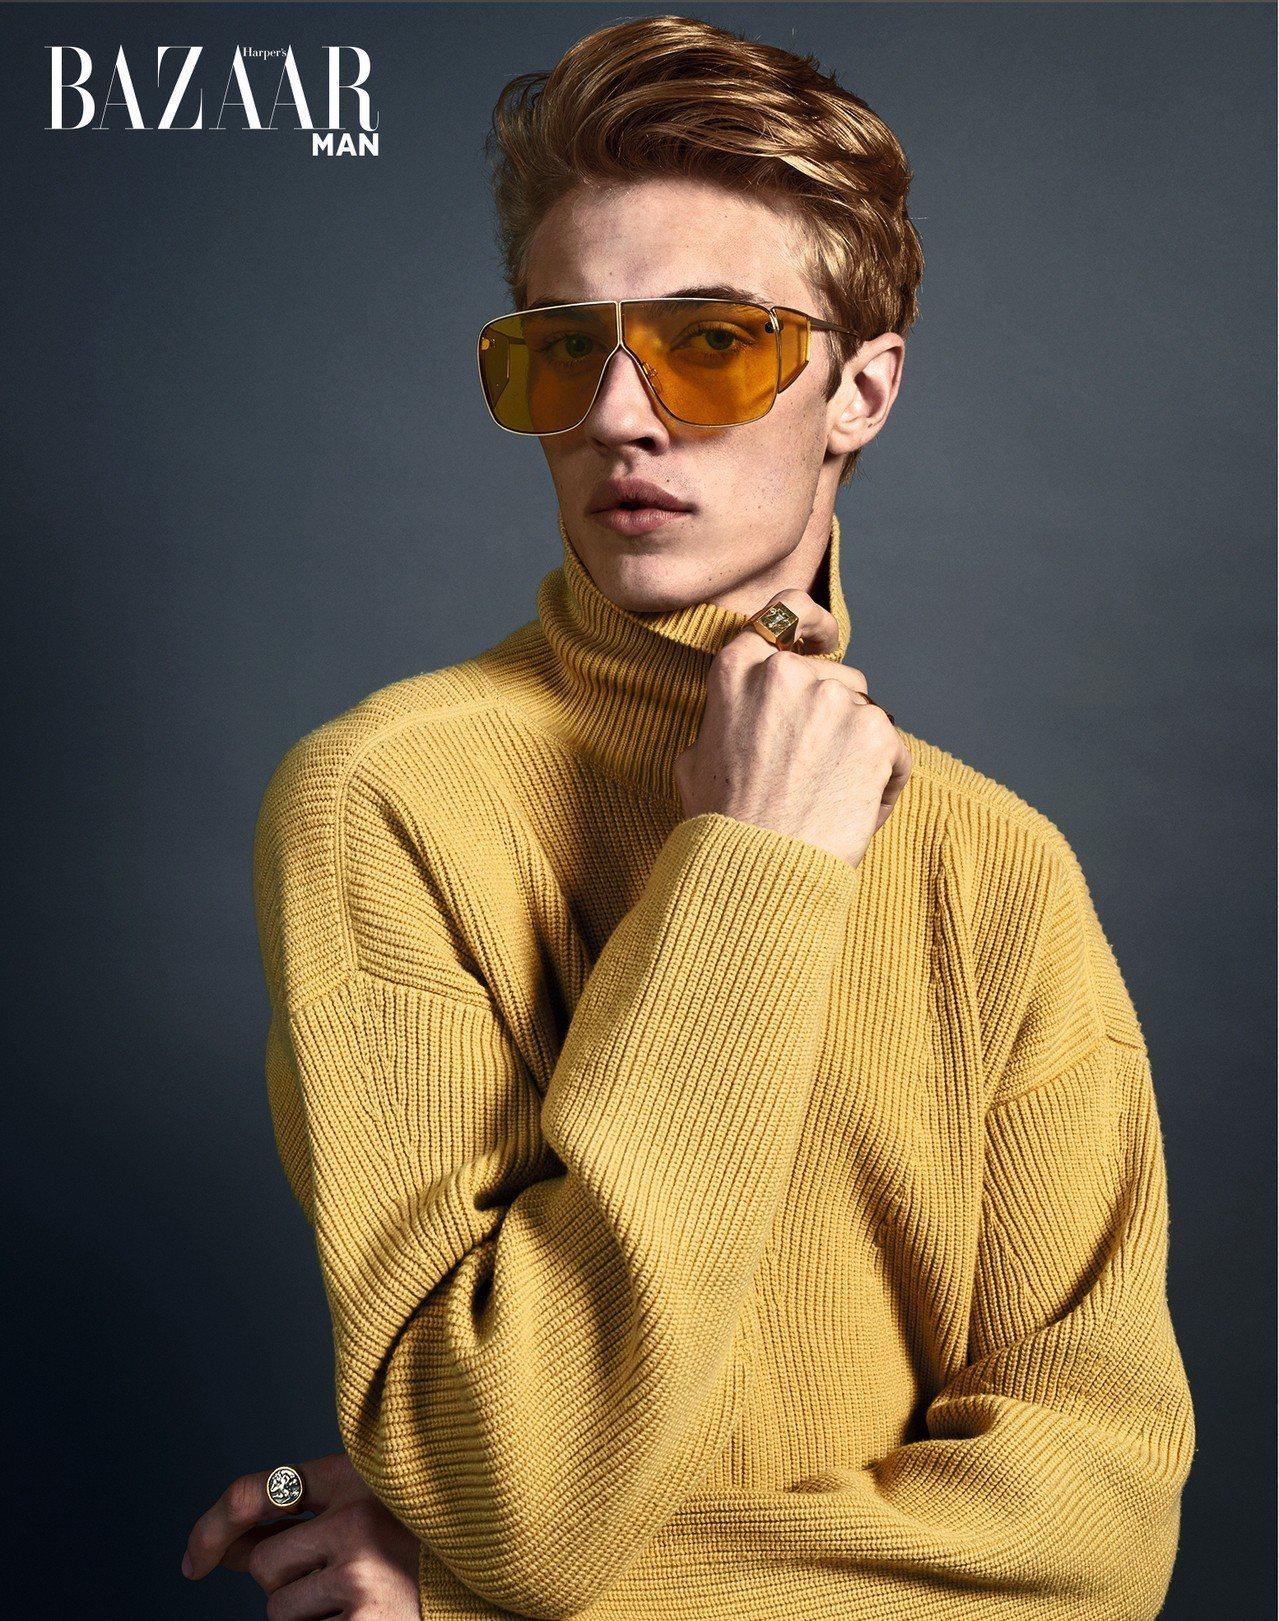 高領針織衫、太陽眼鏡,Tom Ford。 戒指、項鍊,Eli Hali...